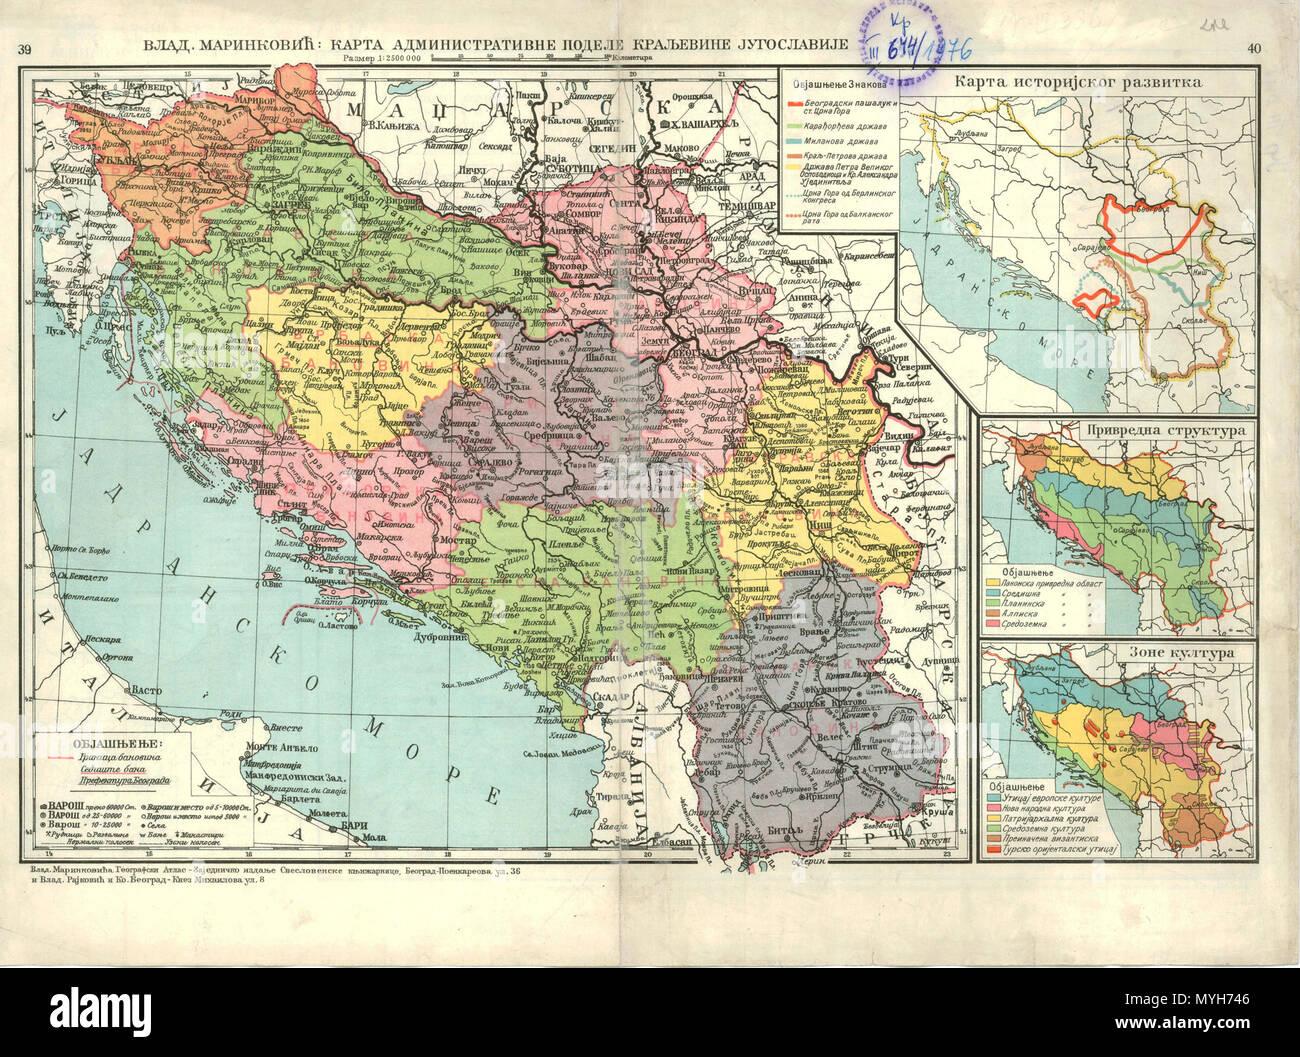 Yugoslavia Map Stock Photos & Yugoslavia Map Stock Images - Alamy on greece on world map, france on world map, ukraine on world map, dalmatia on world map, turkey on world map, nicaragua on world map, switzerland on world map, zaire on world map, darfur on world map, europe on world map, ussr on world map, albania on world map, isreal on world map, hungary on world map, belgium on world map, iraq on world map, pakistan on world map, serbia map, ireland on world map, argentina on world map,